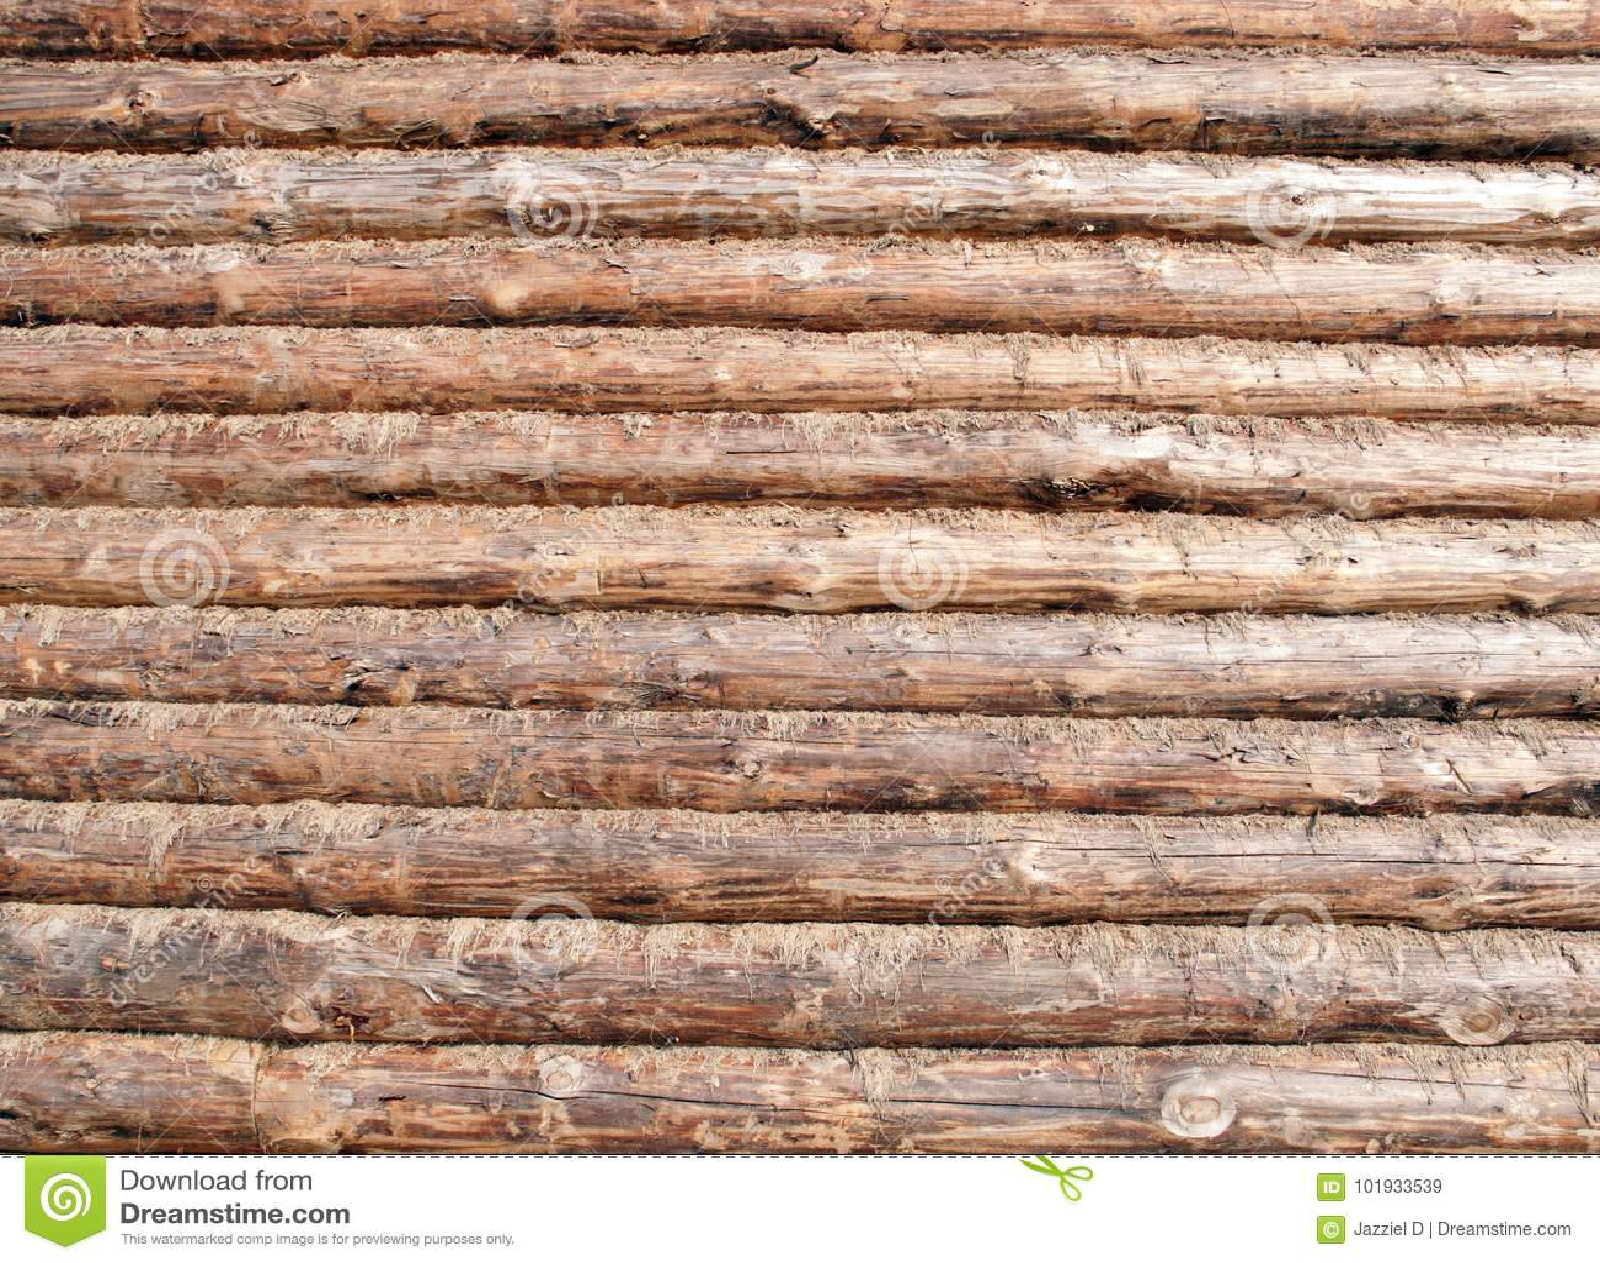 Pared cortada de la cabaña de madera moderna de afuera, superficie de madera